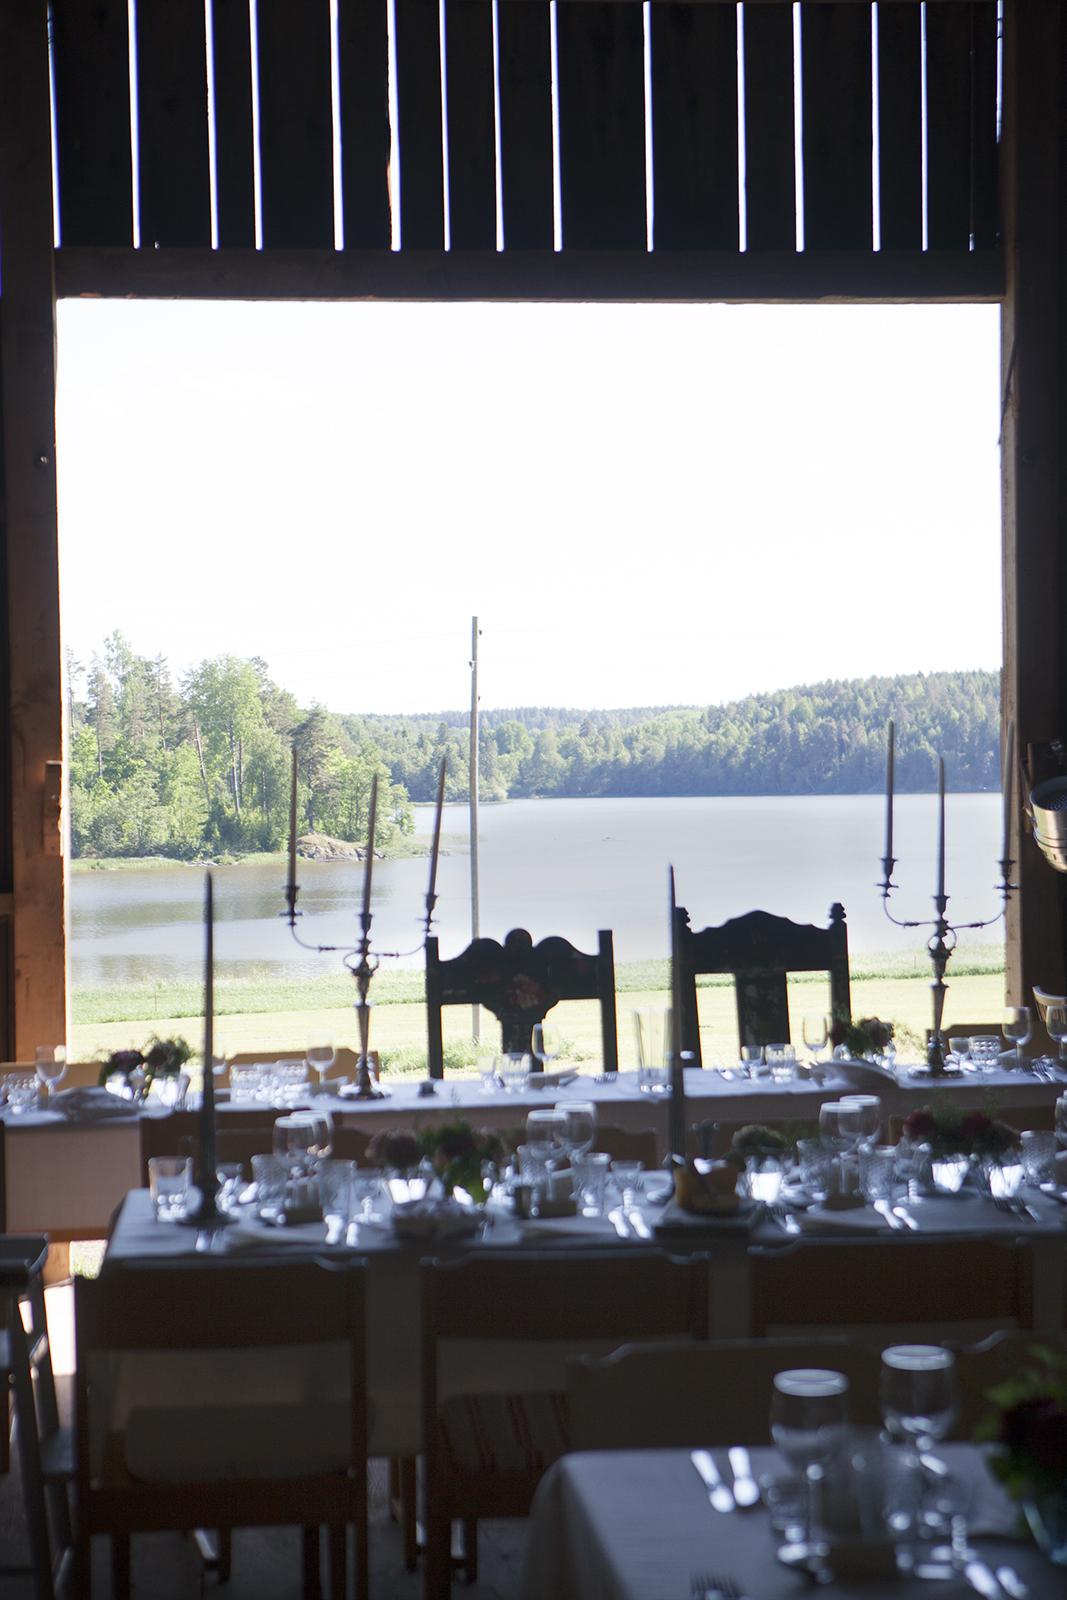 Bröllop på landet, bröllopslokal festlokal lokal event södermanland sörmland nyköping stockholm